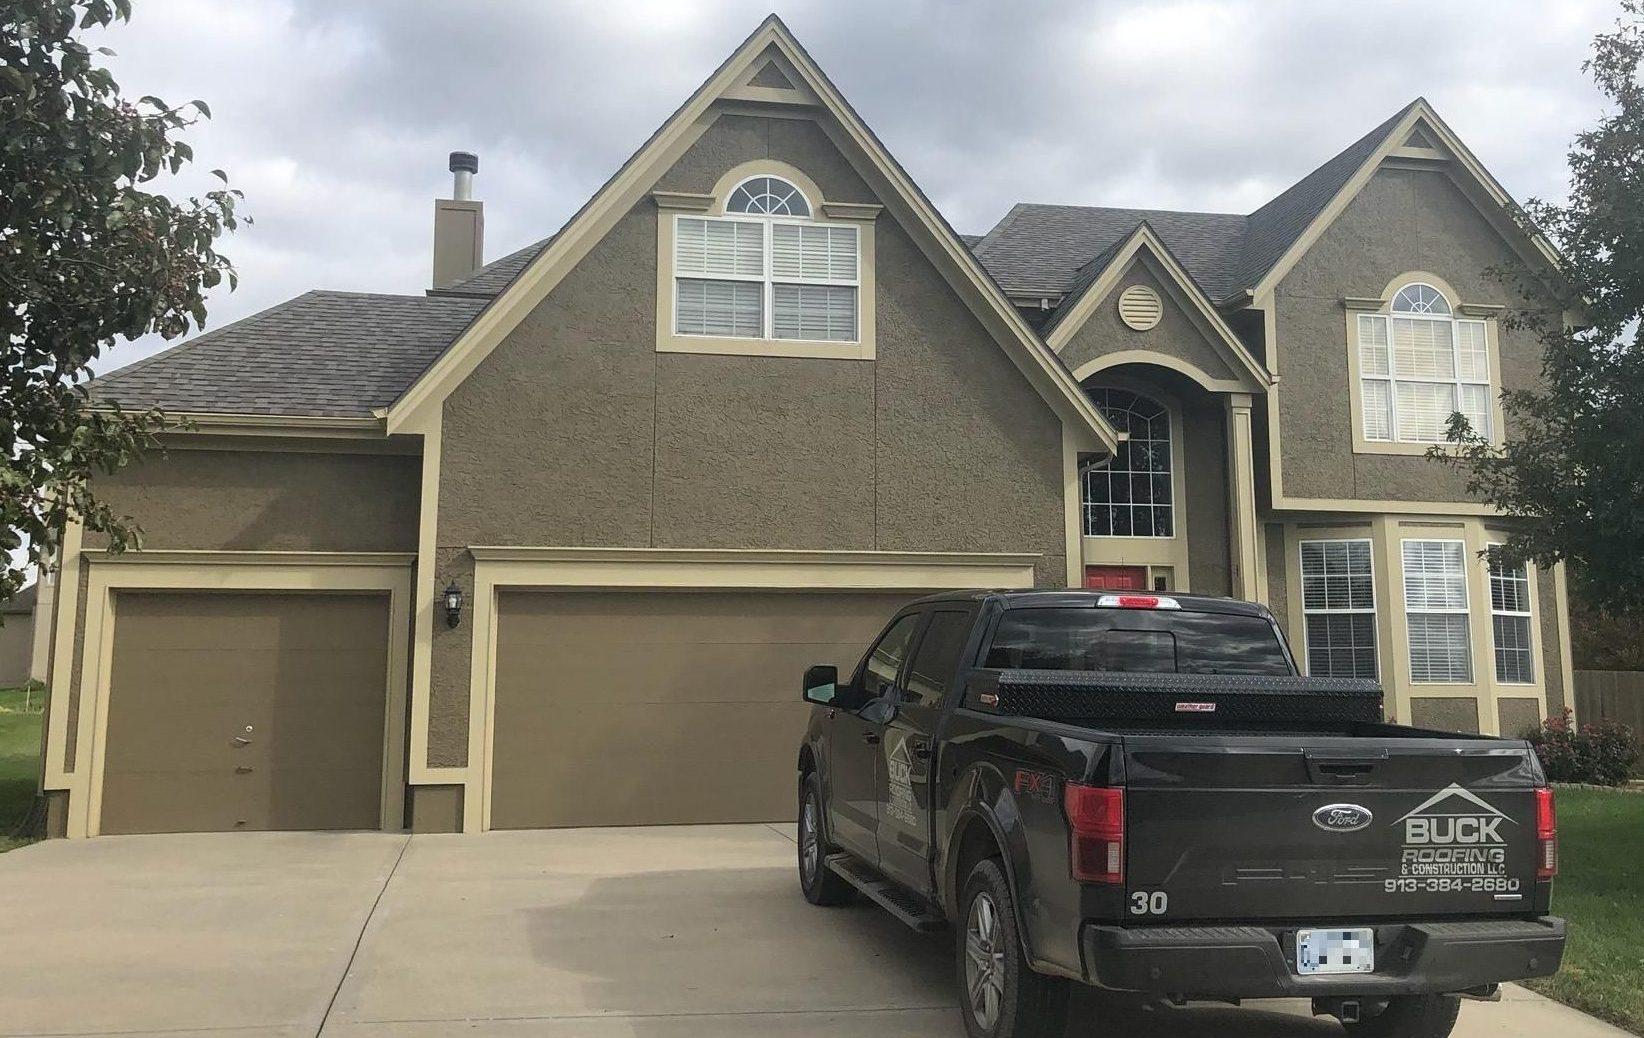 Buck Roofing - Residential Roofing - Kansas & Missouri - Certainteed Landmark - Weathered Wood - Certainteed XT25 Ridge